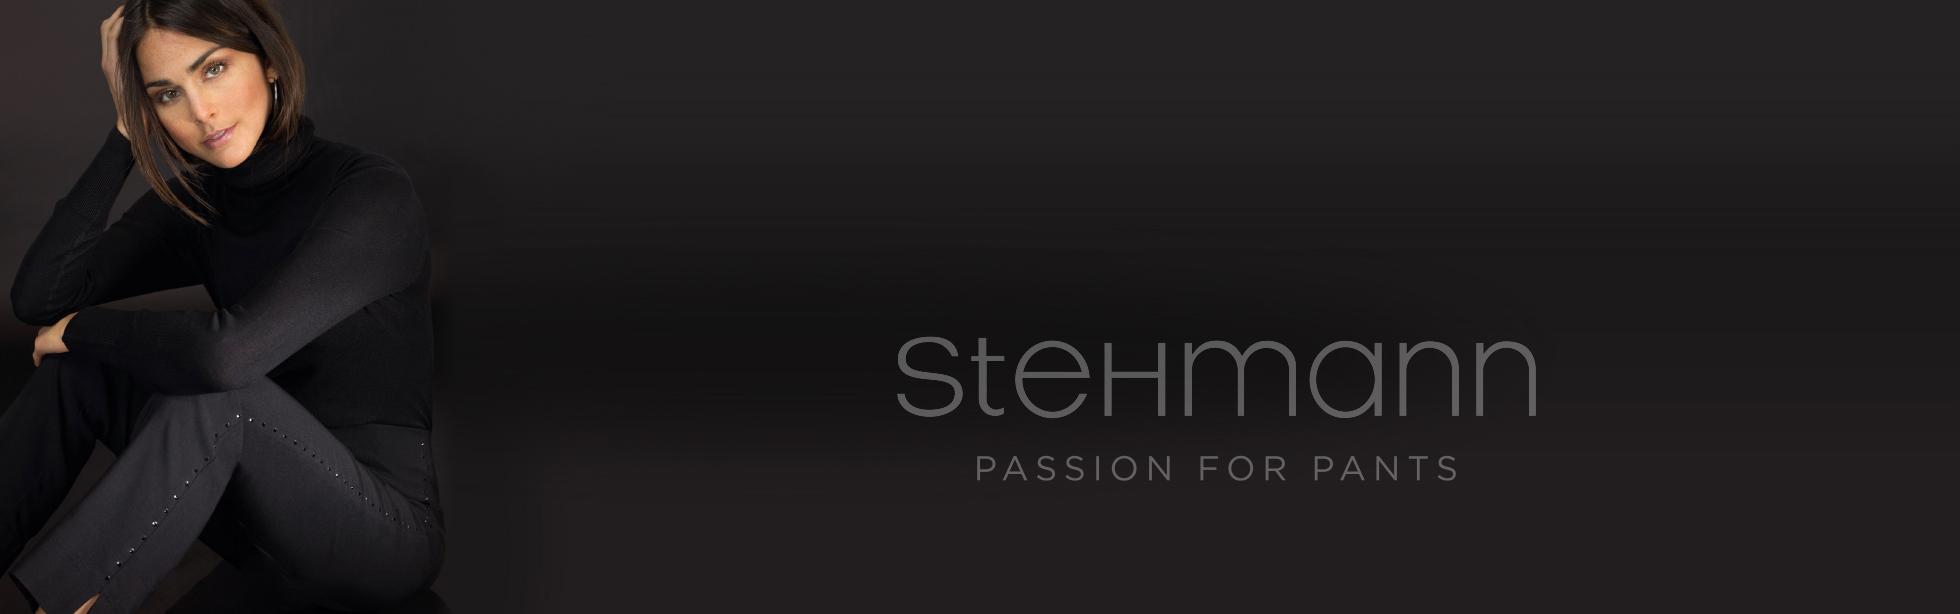 Header Stechmann